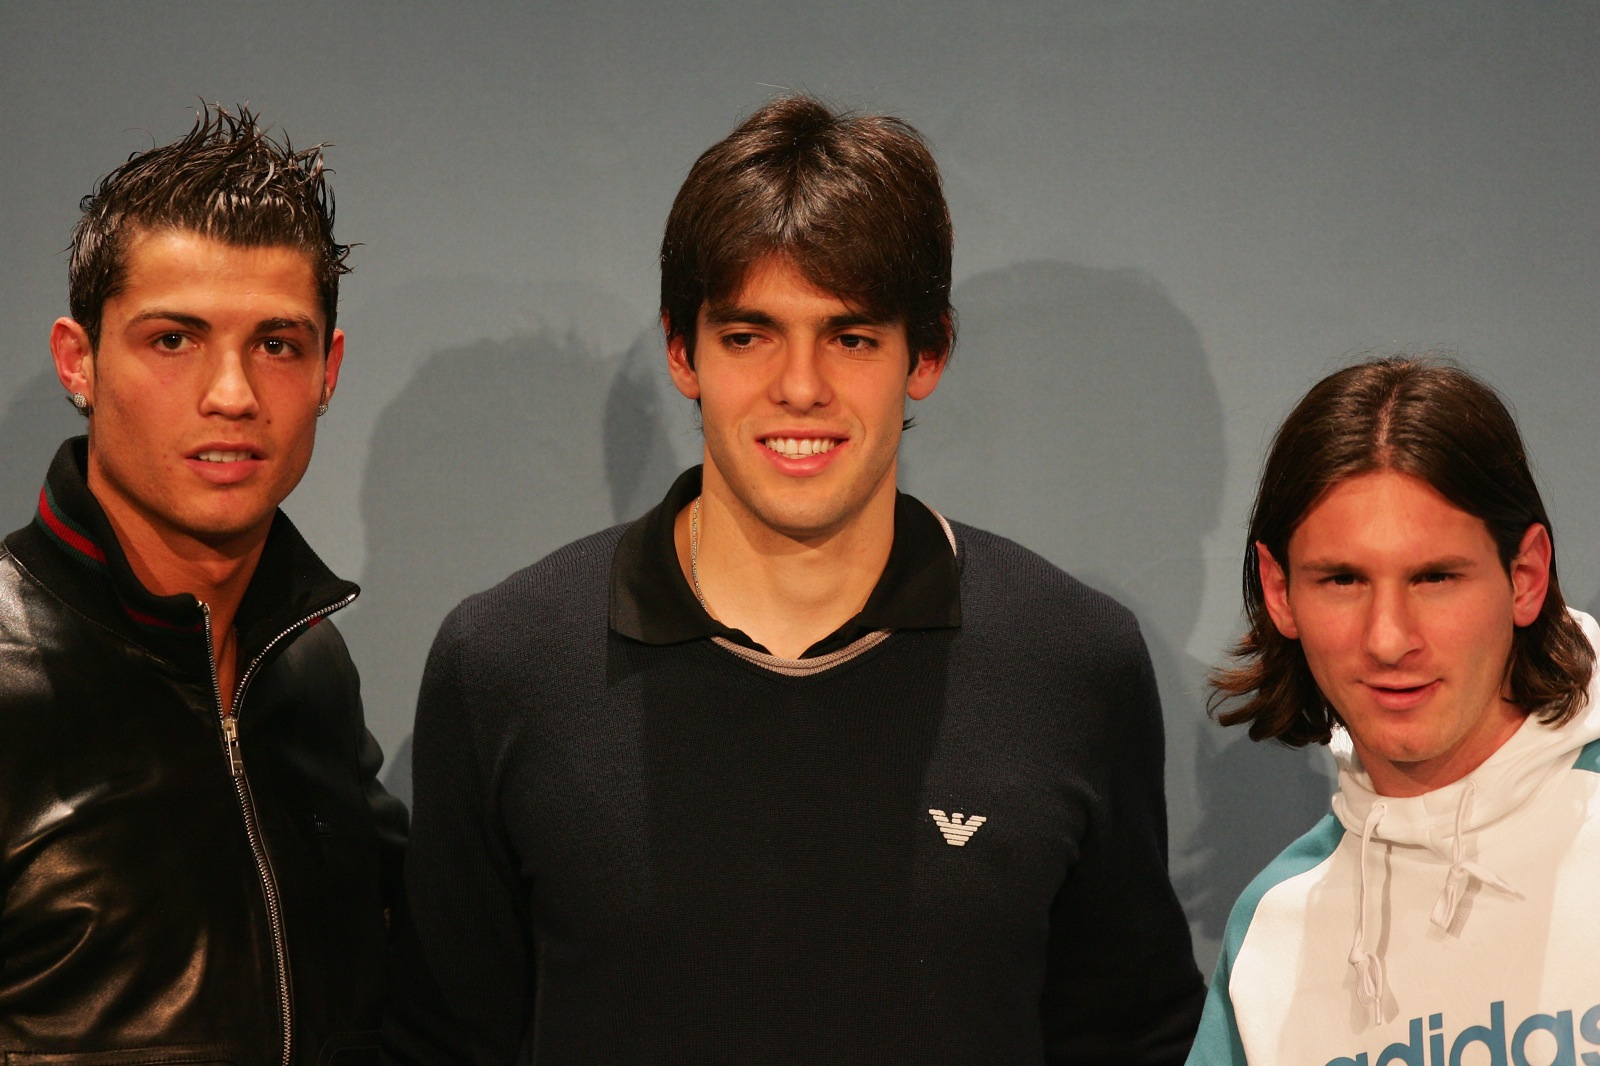 http://3.bp.blogspot.com/_YXnKvHGYsu4/TCLELorISpI/AAAAAAAAAXc/vNmTWRVckD4/s1600/Ronaldo-Kaka-Messi.jpg